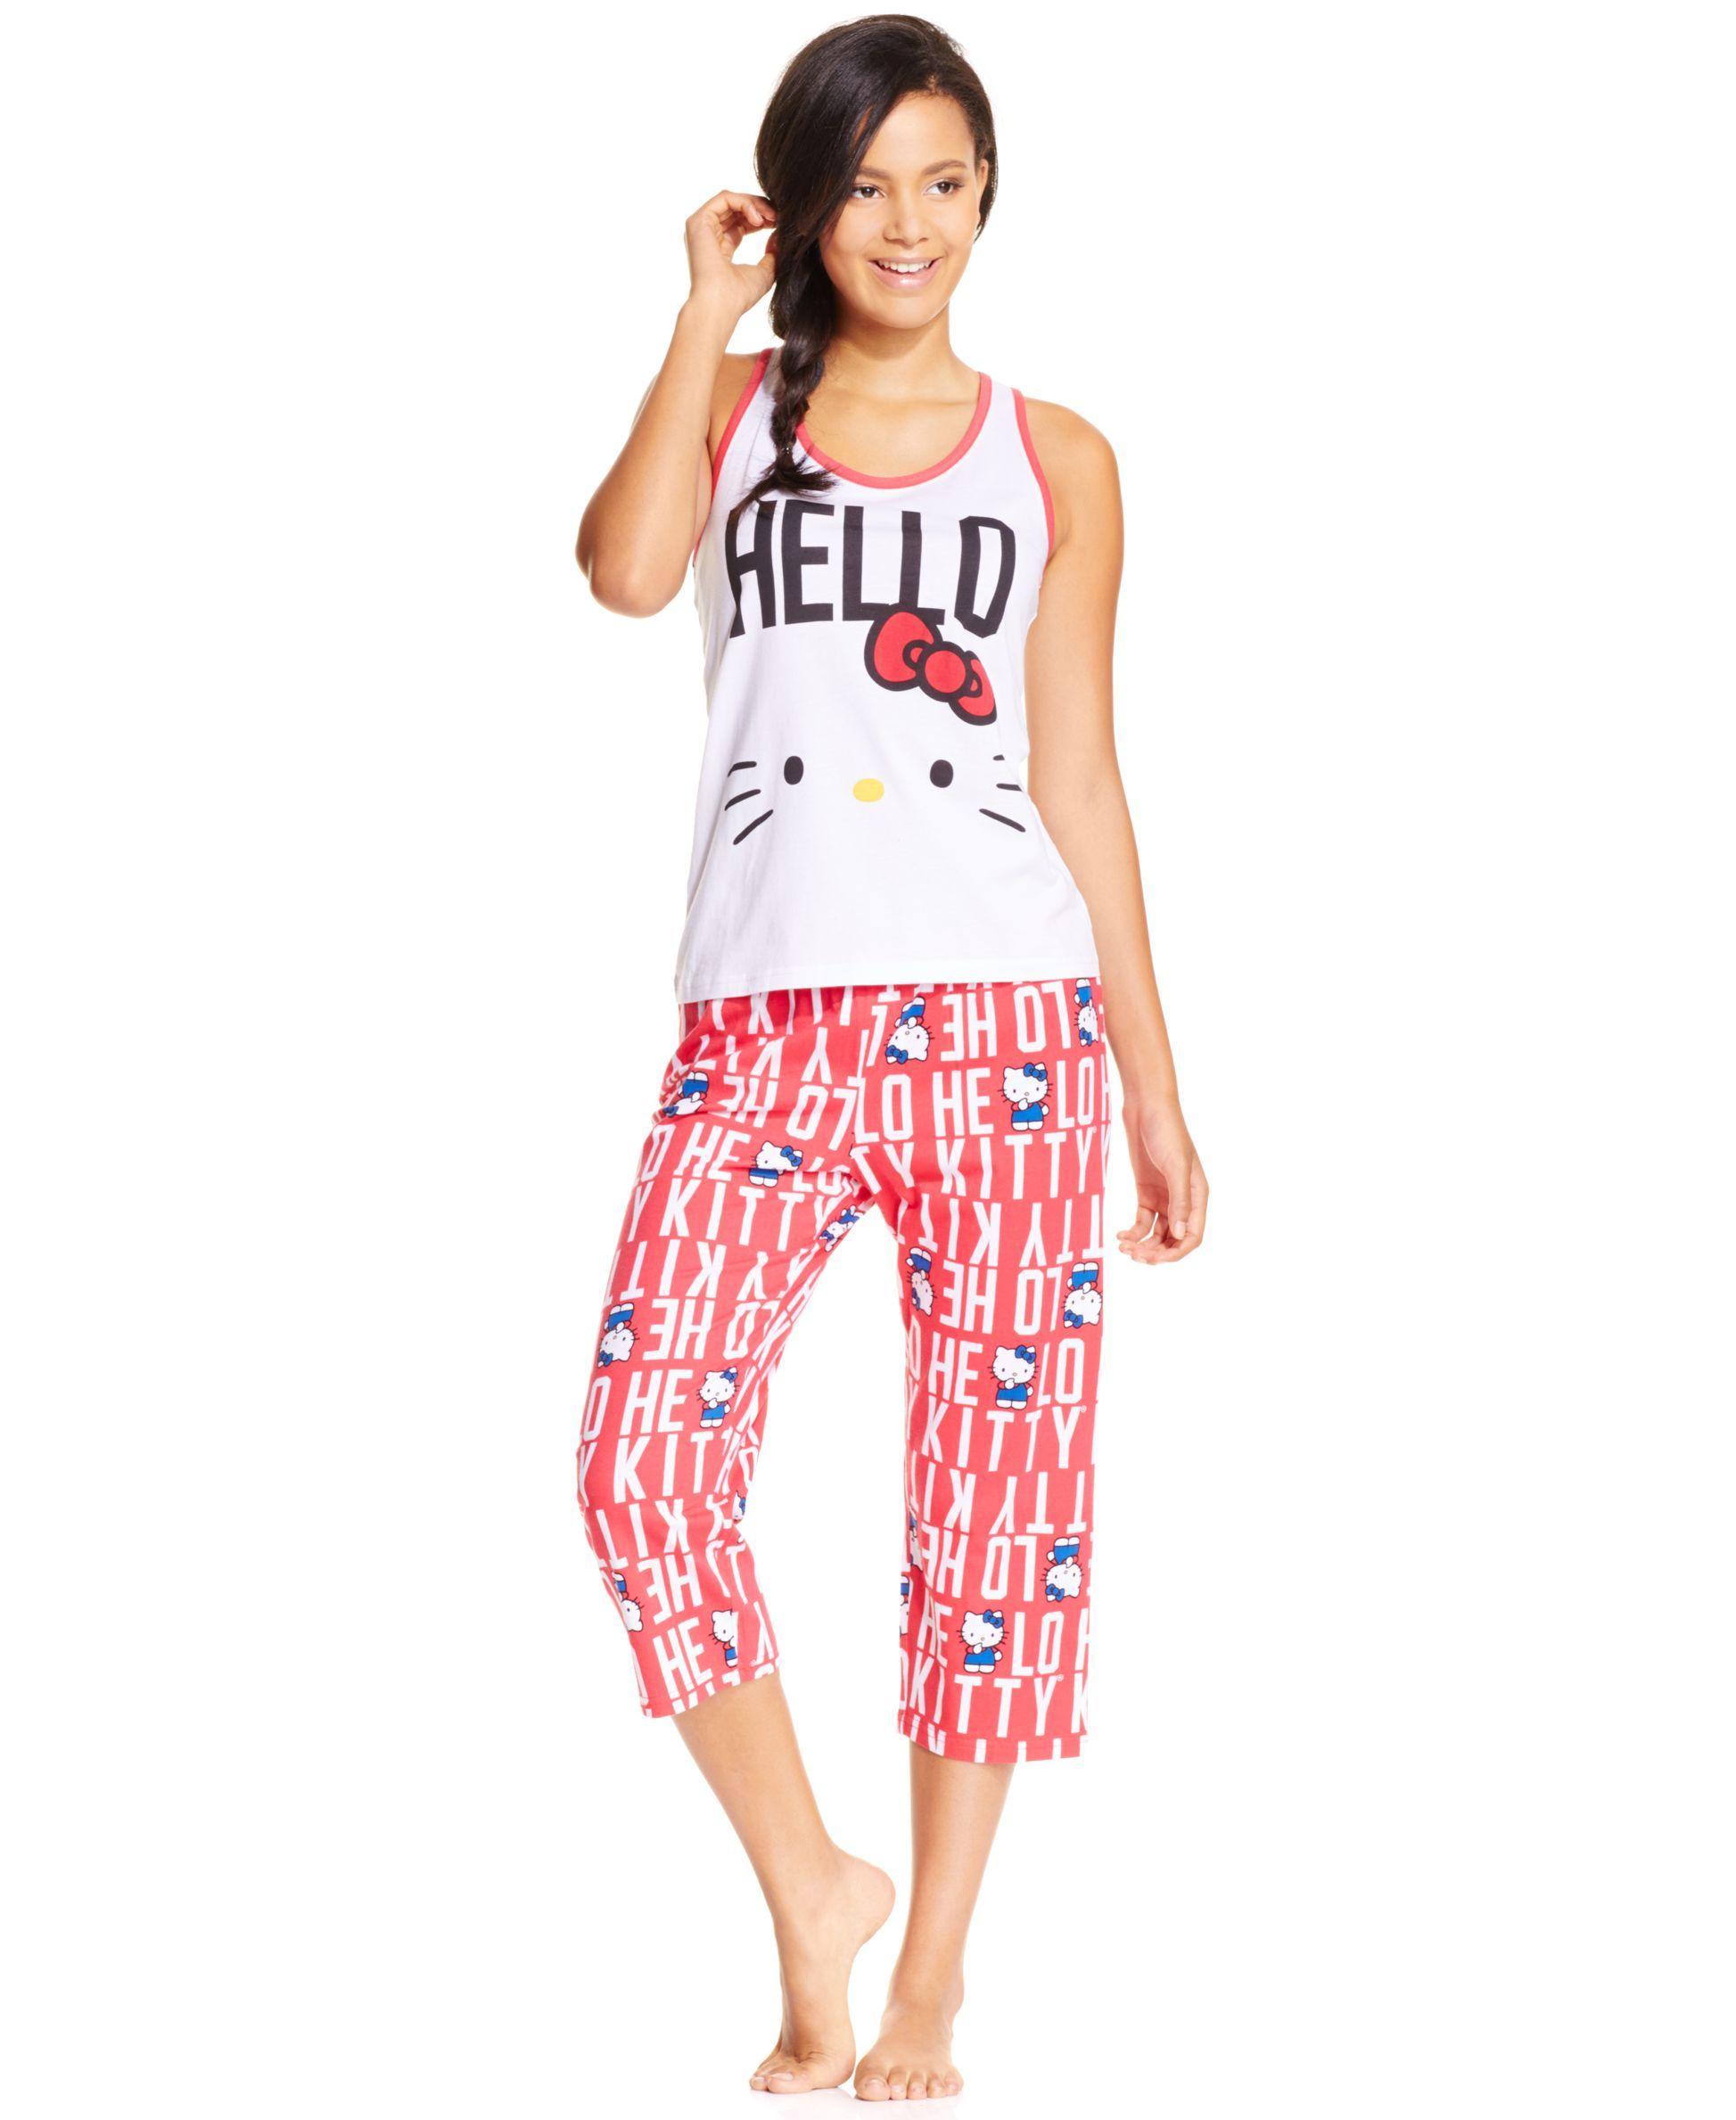 6263595c5 Hello Kitty Patriotic Tank and Capri Pajama Pants Set | Products ...